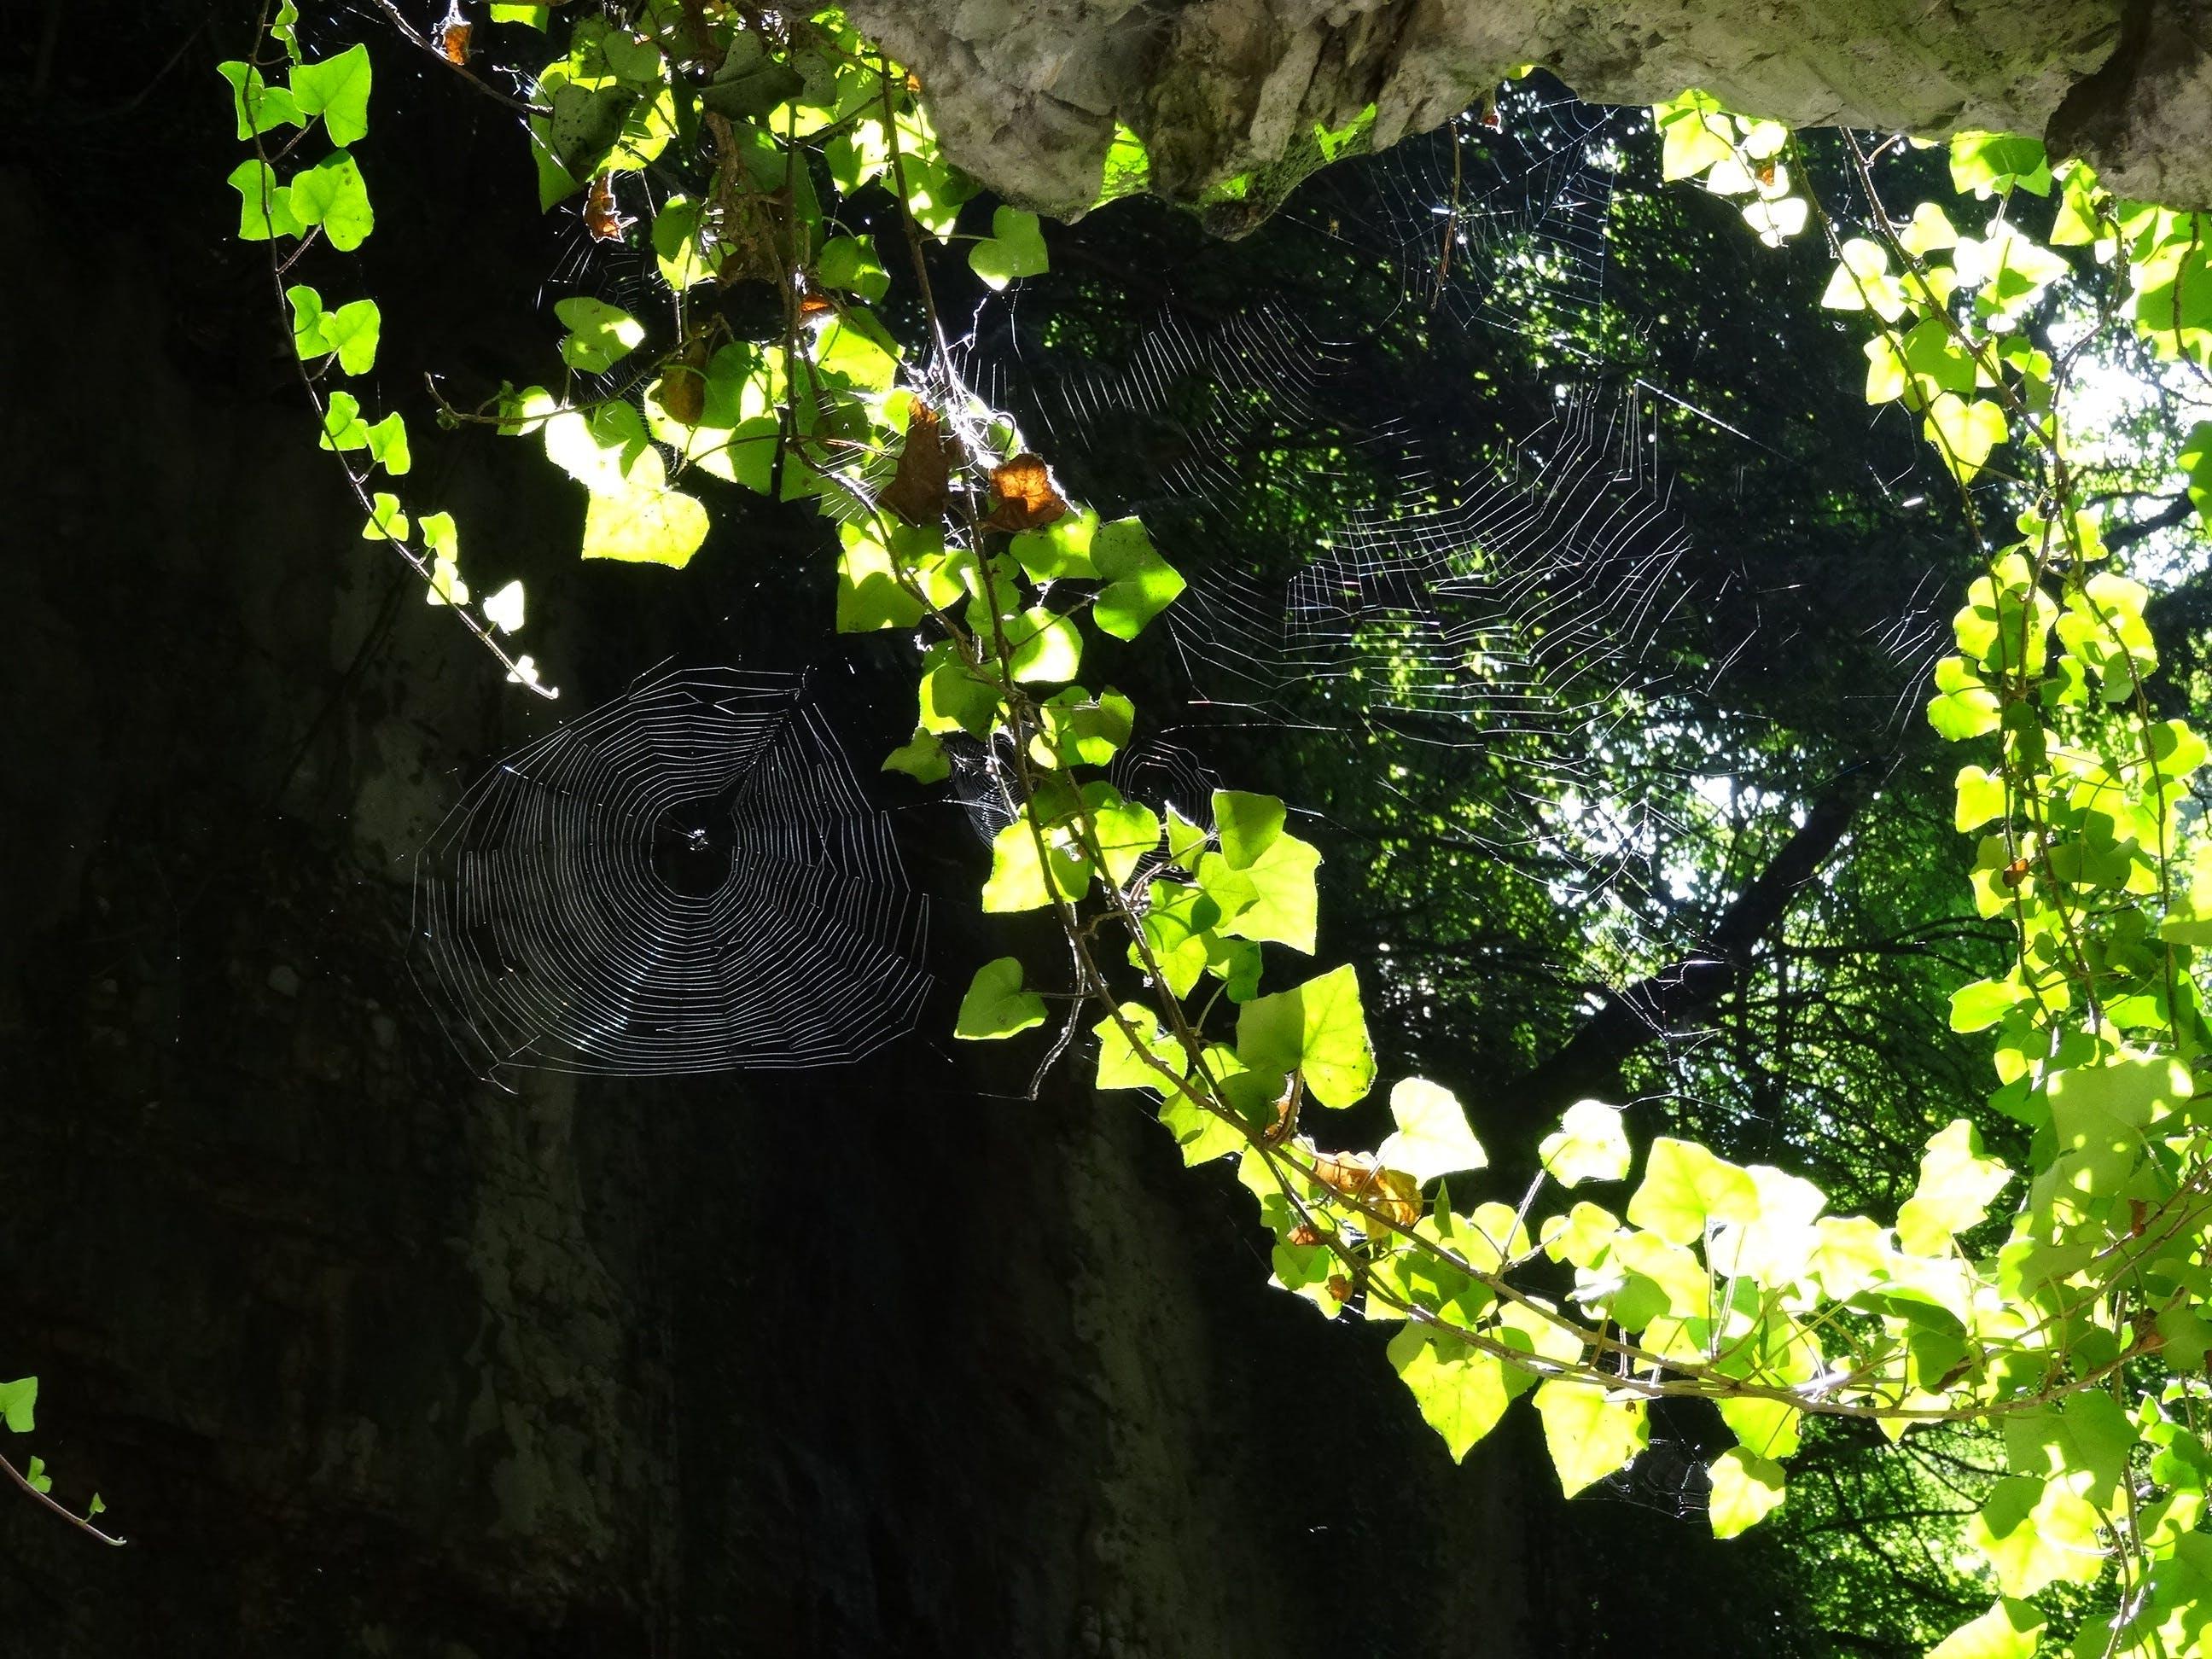 Free stock photo of nature, rock, cobweb, ivy